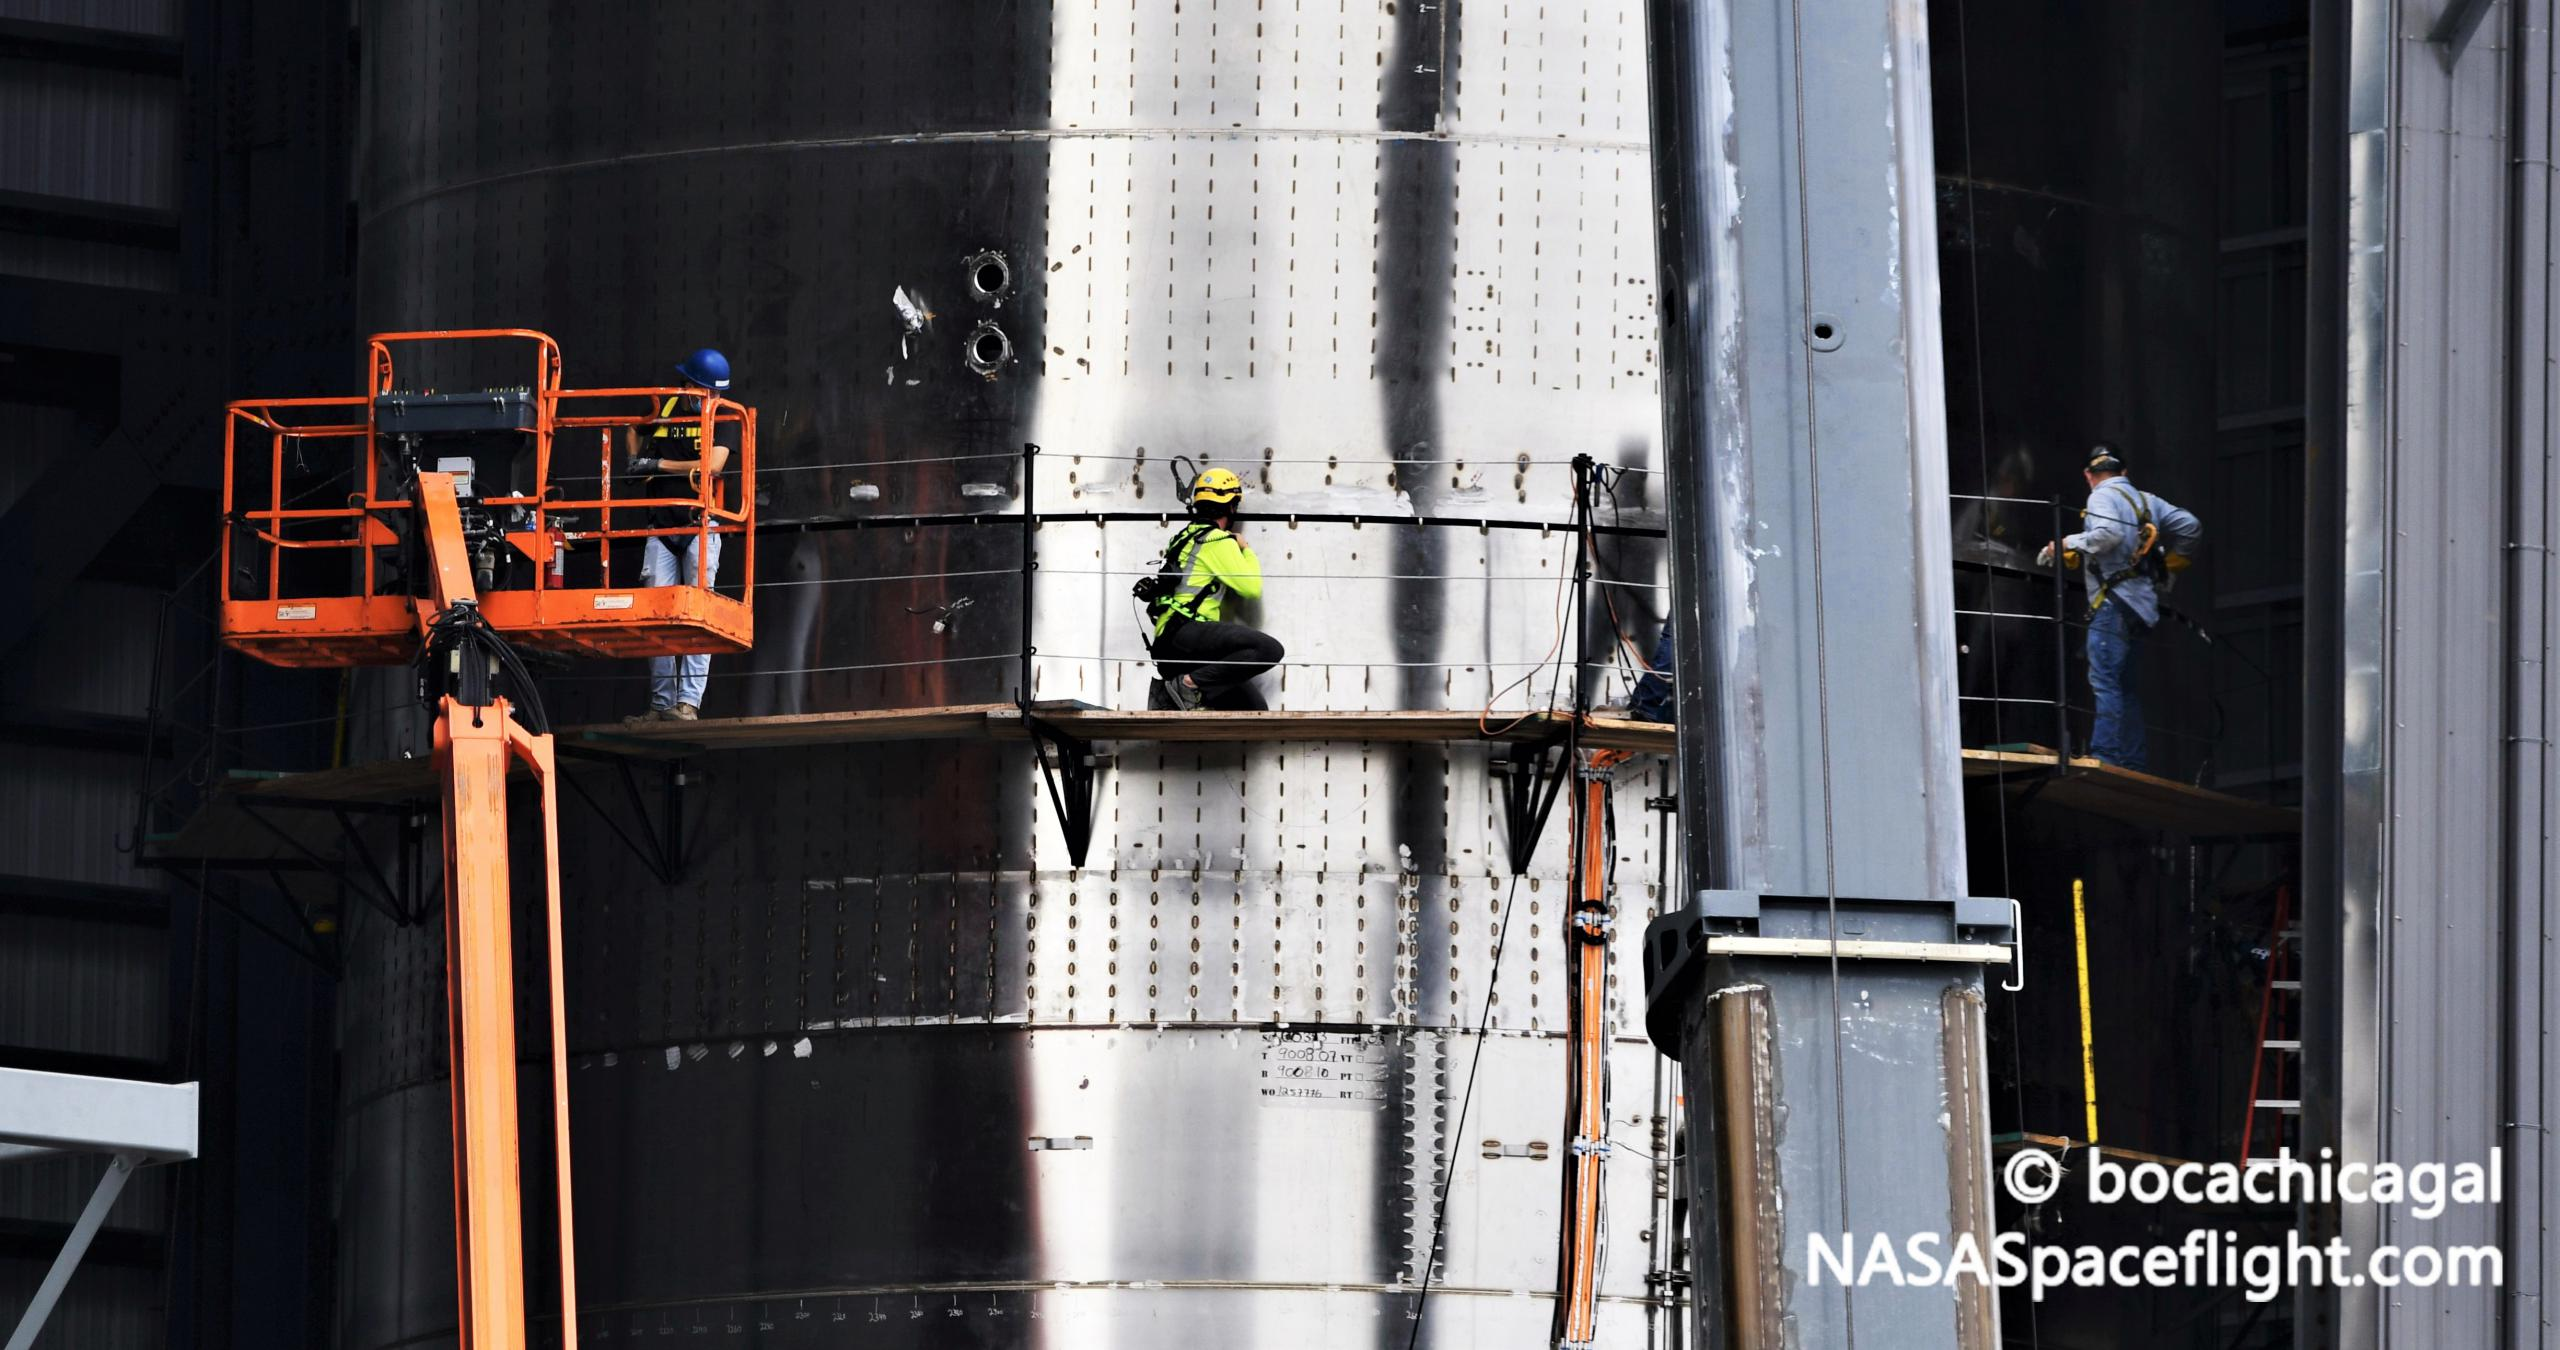 Starship Boca Chica 112520 (NASASpaceflight – bocachicagal) SN9 nose install 6 crop (c)